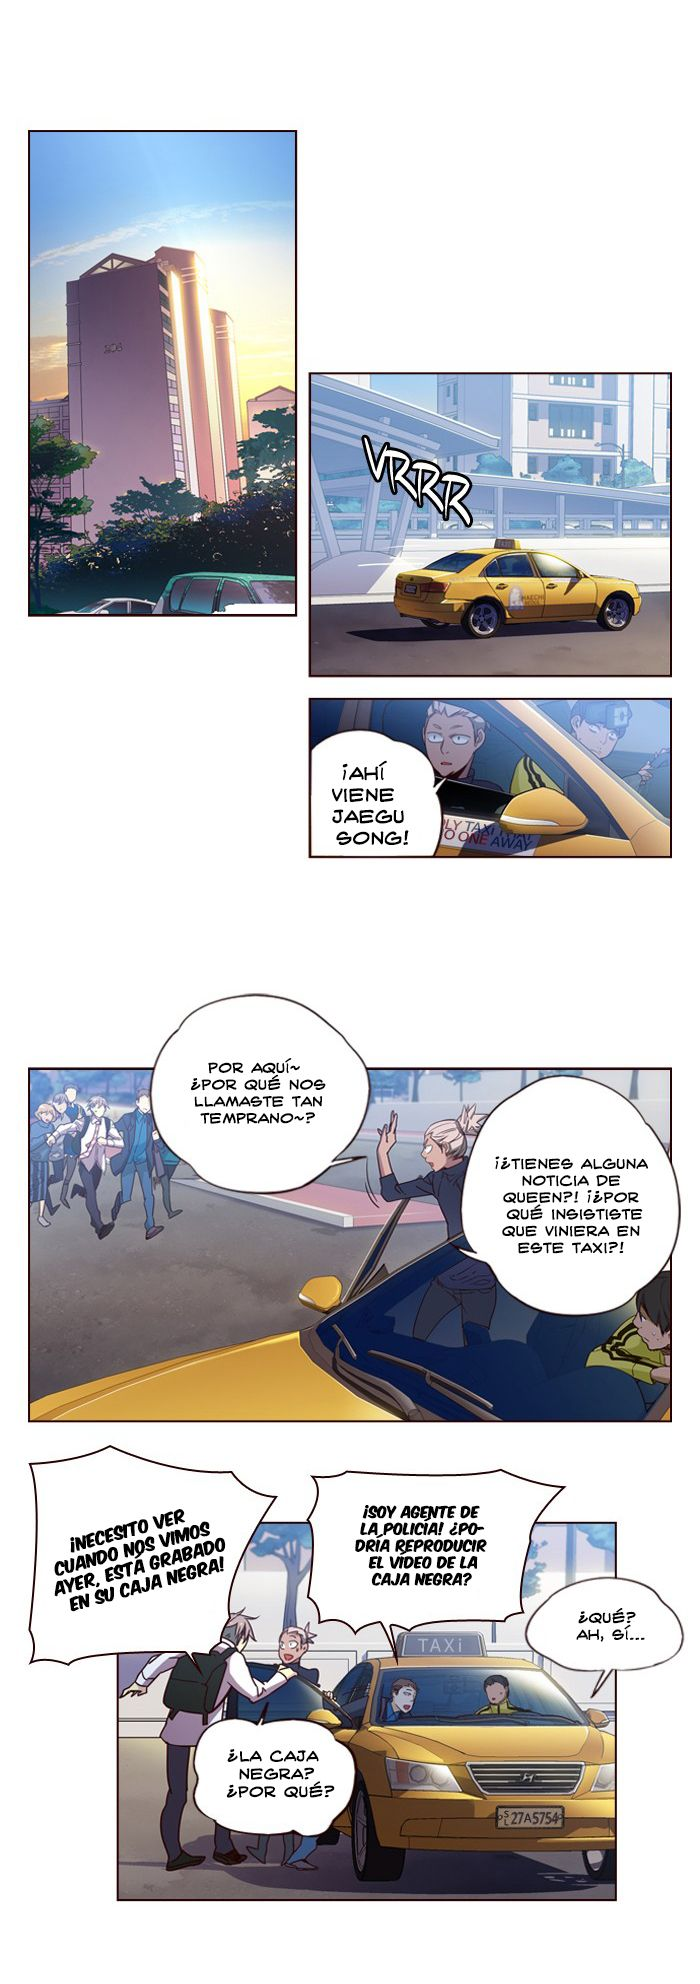 http://c5.ninemanga.com/es_manga/32/416/462763/6645081a541d23e1920405959a3e23d9.jpg Page 5